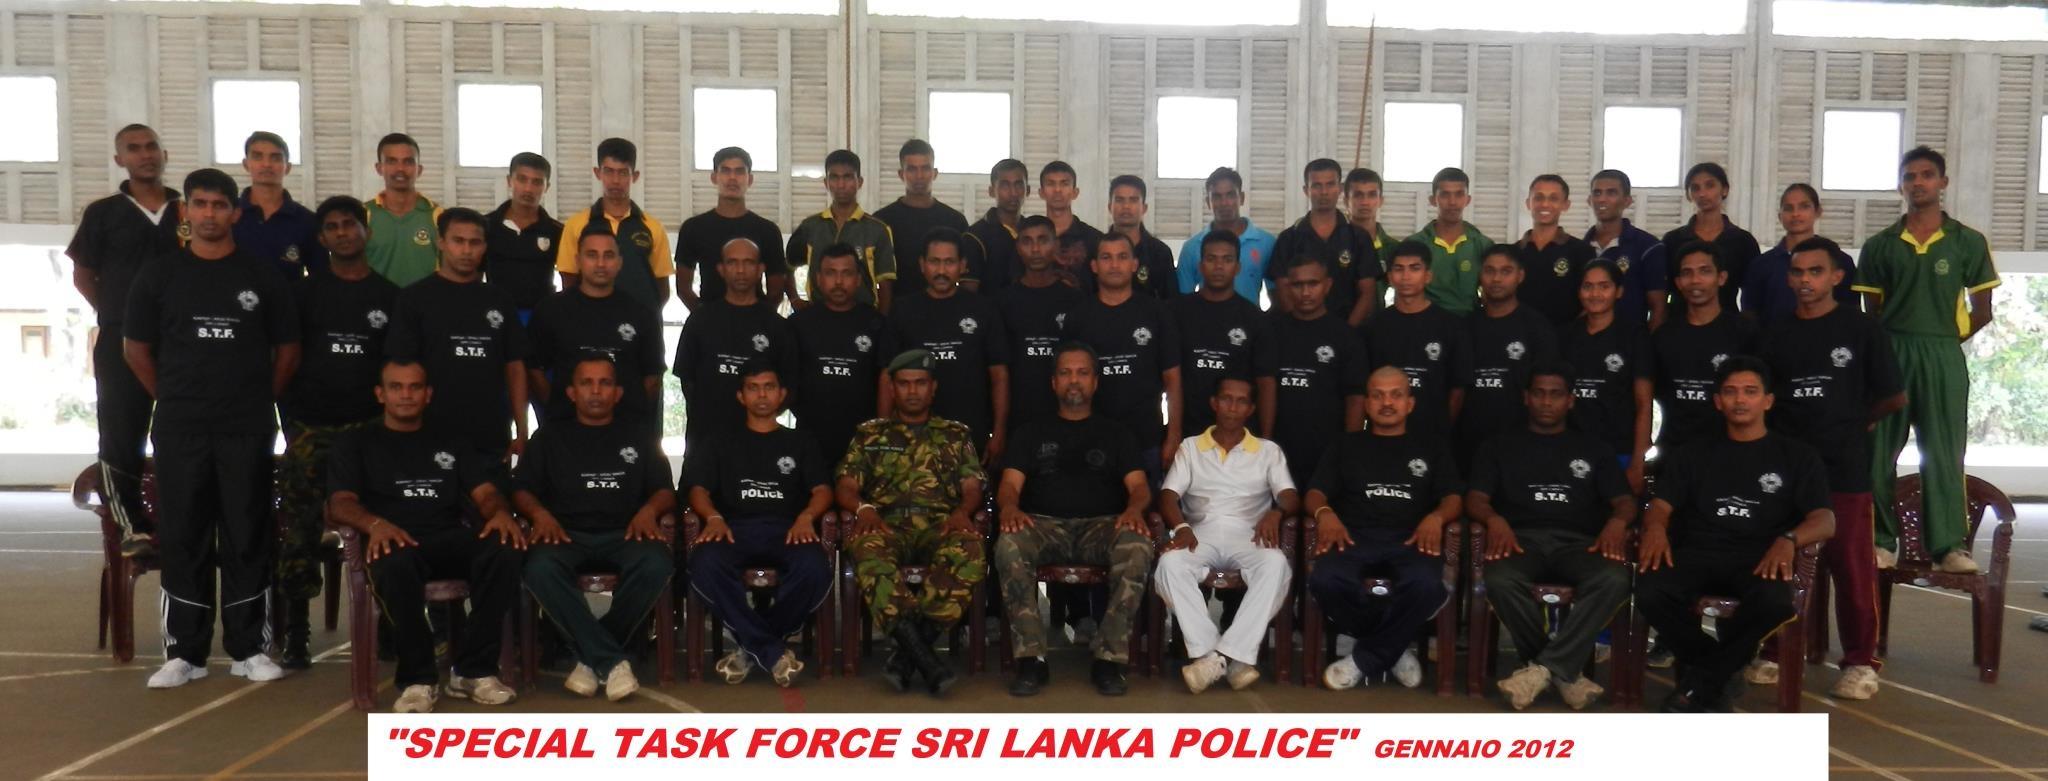 Military Training Krav Maga Sri Lanka